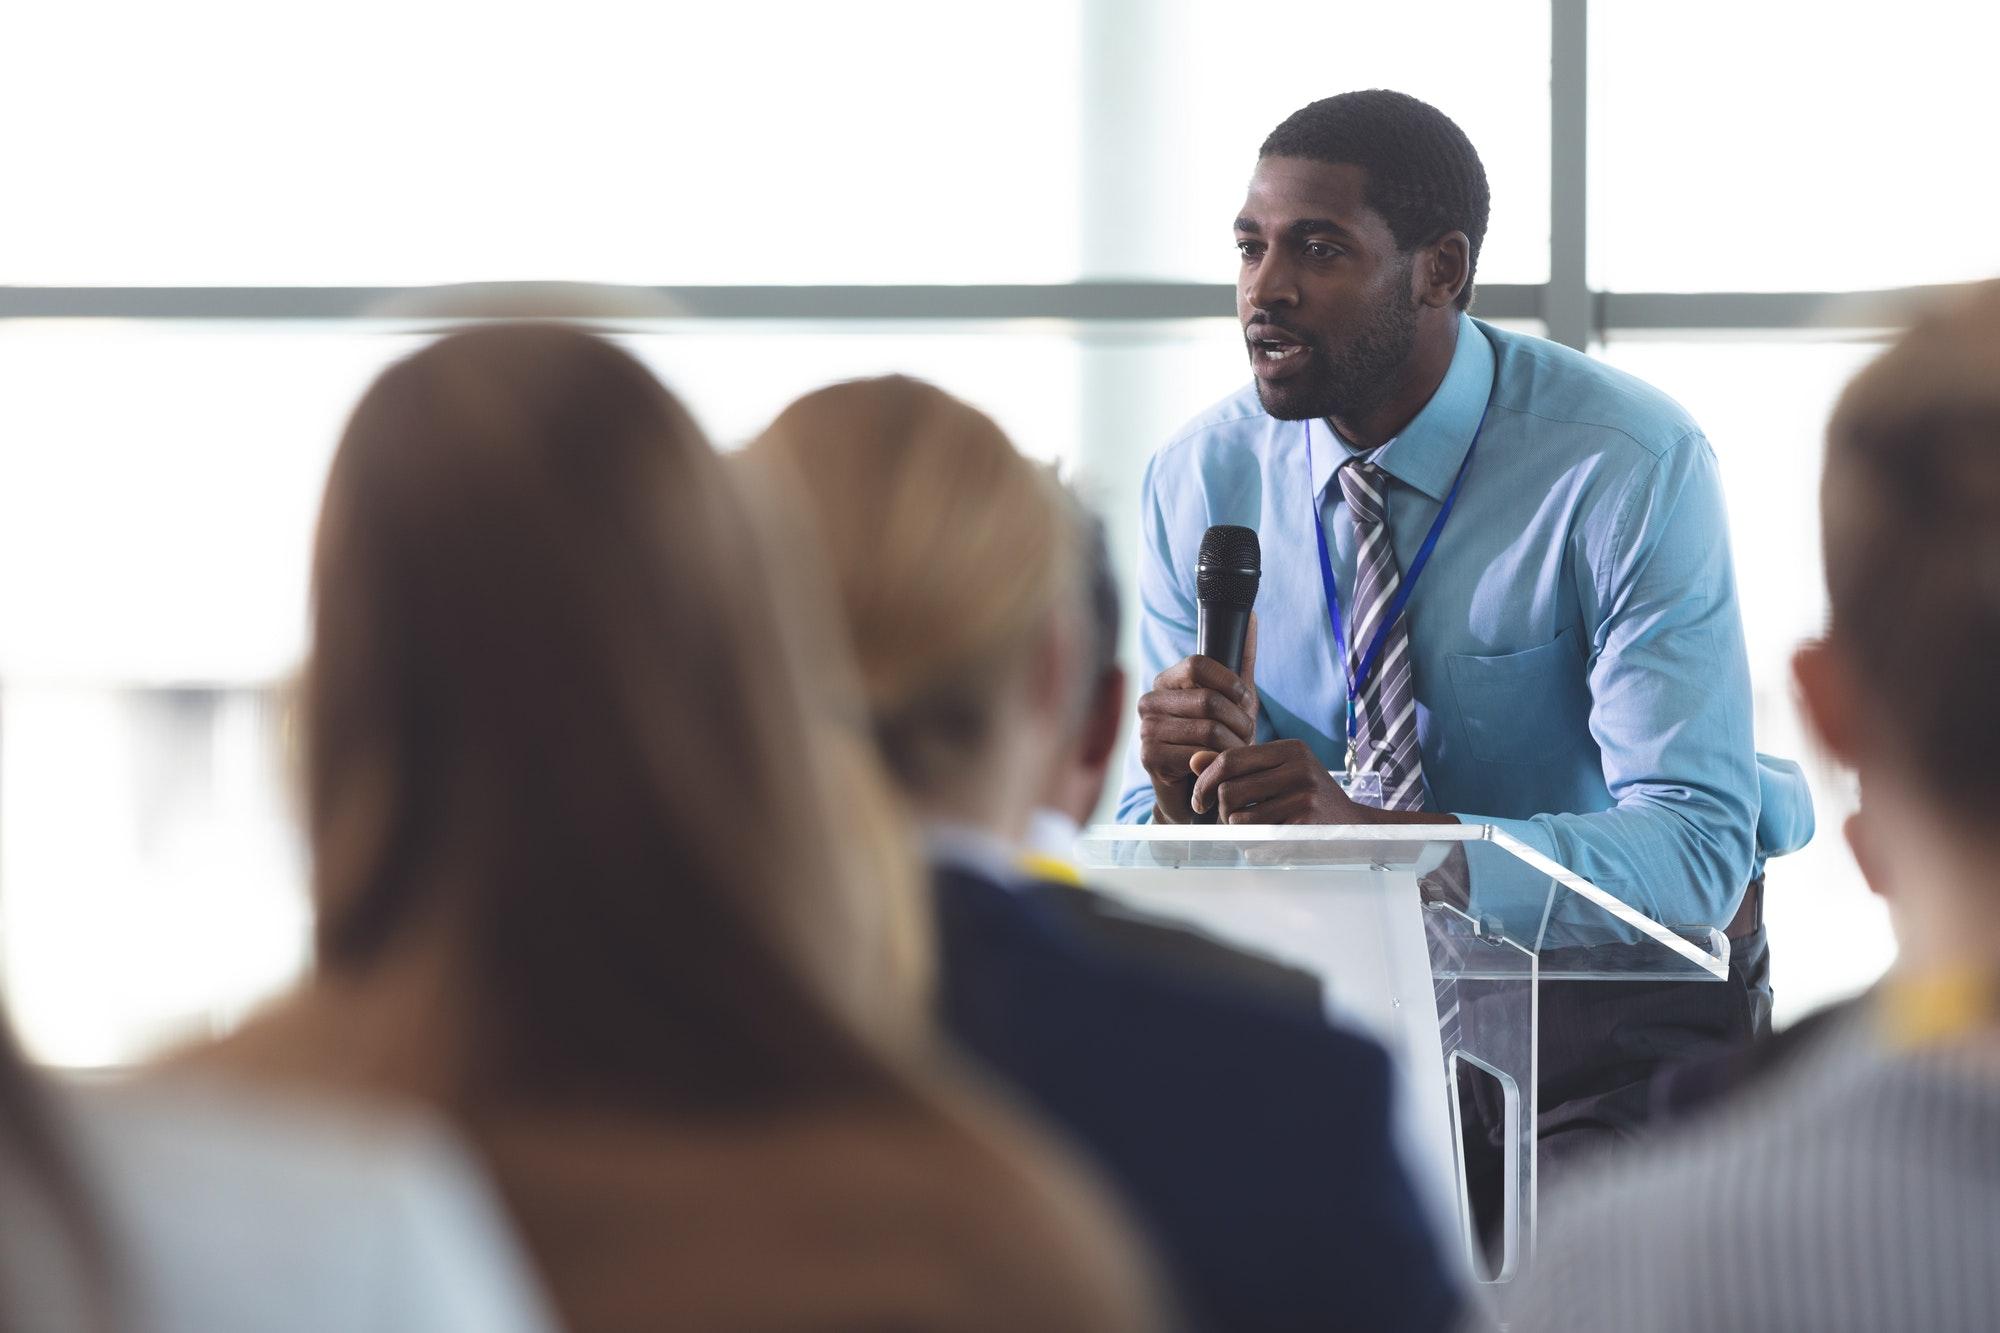 African-American businessman speaker speaking in a business seminar